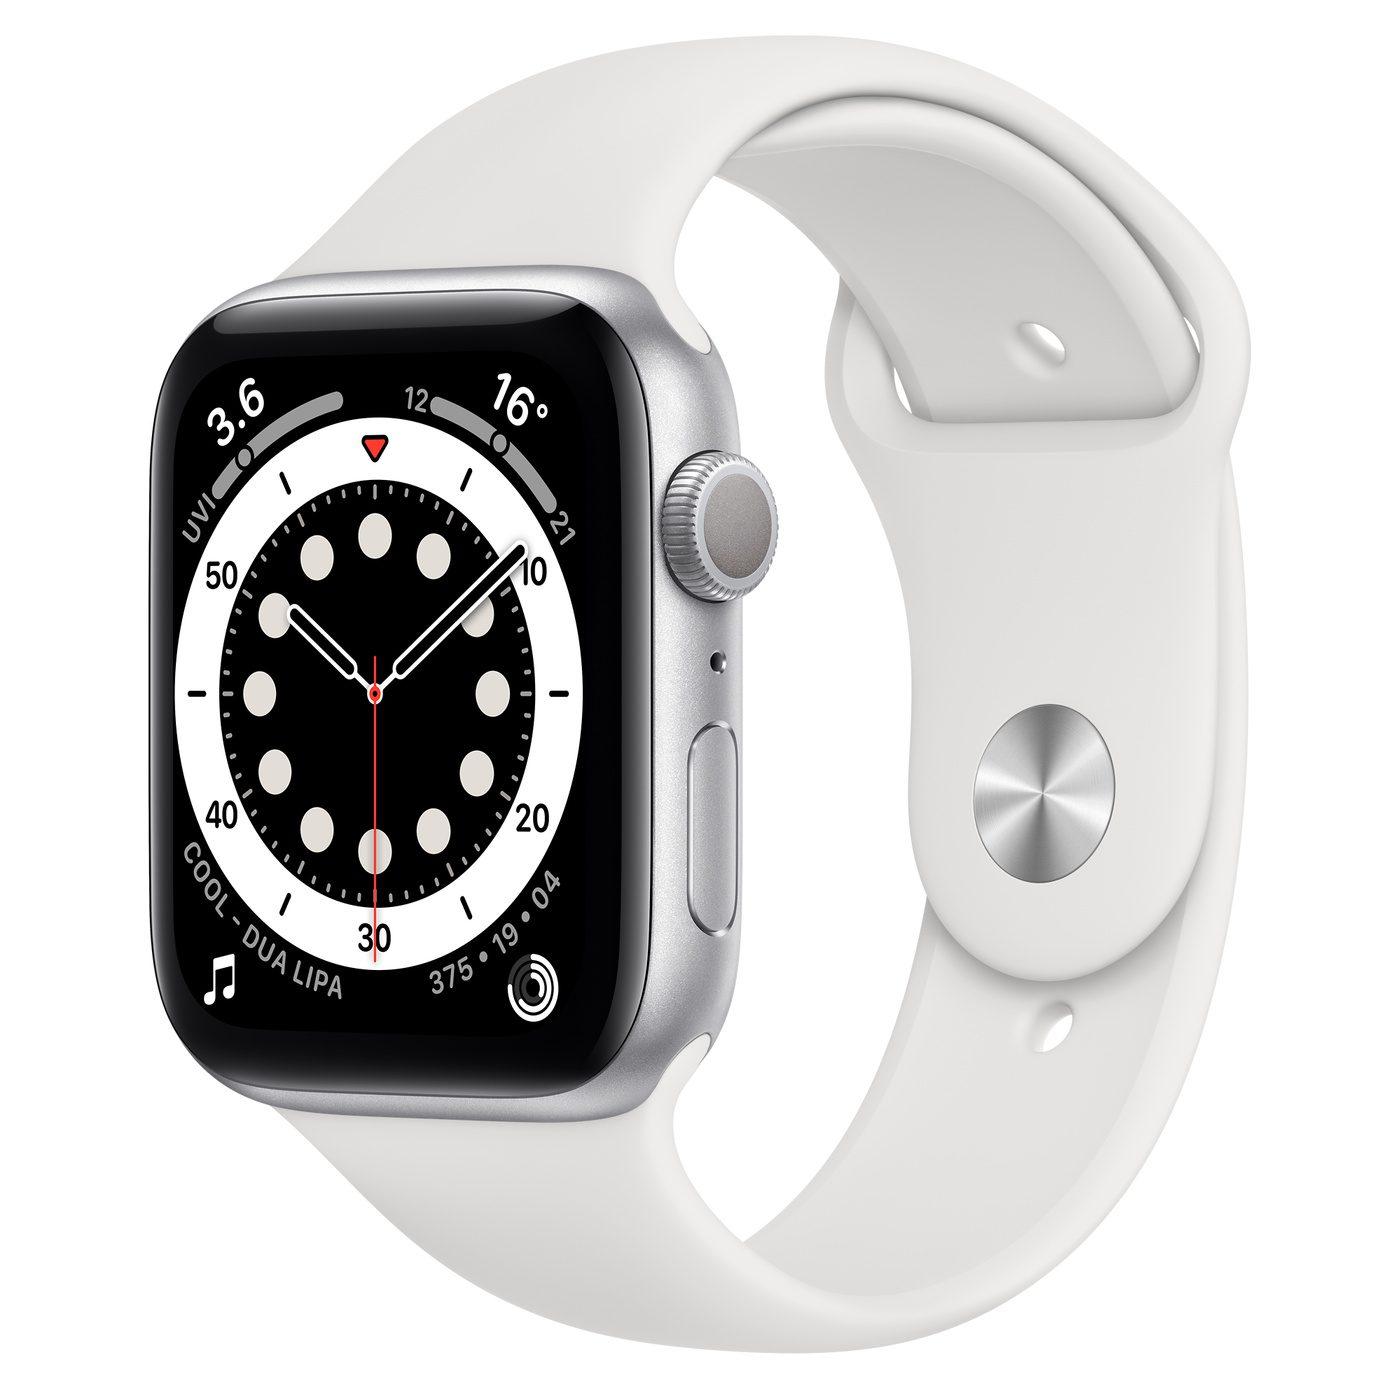 apple watch 6 | Top 10 best smartwatches in India 2021